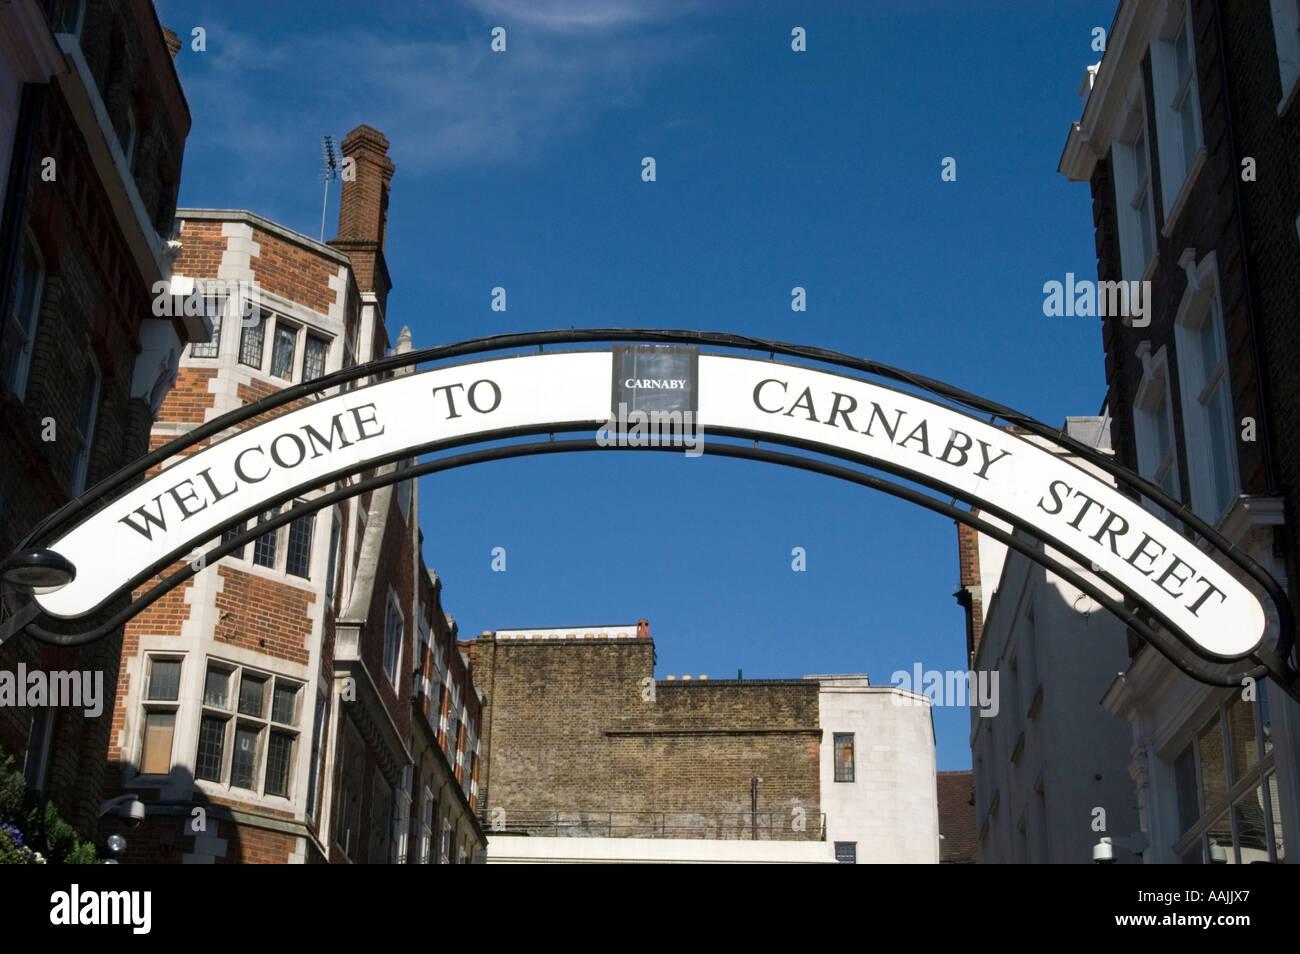 Carnaby Street London England UK - Stock Image